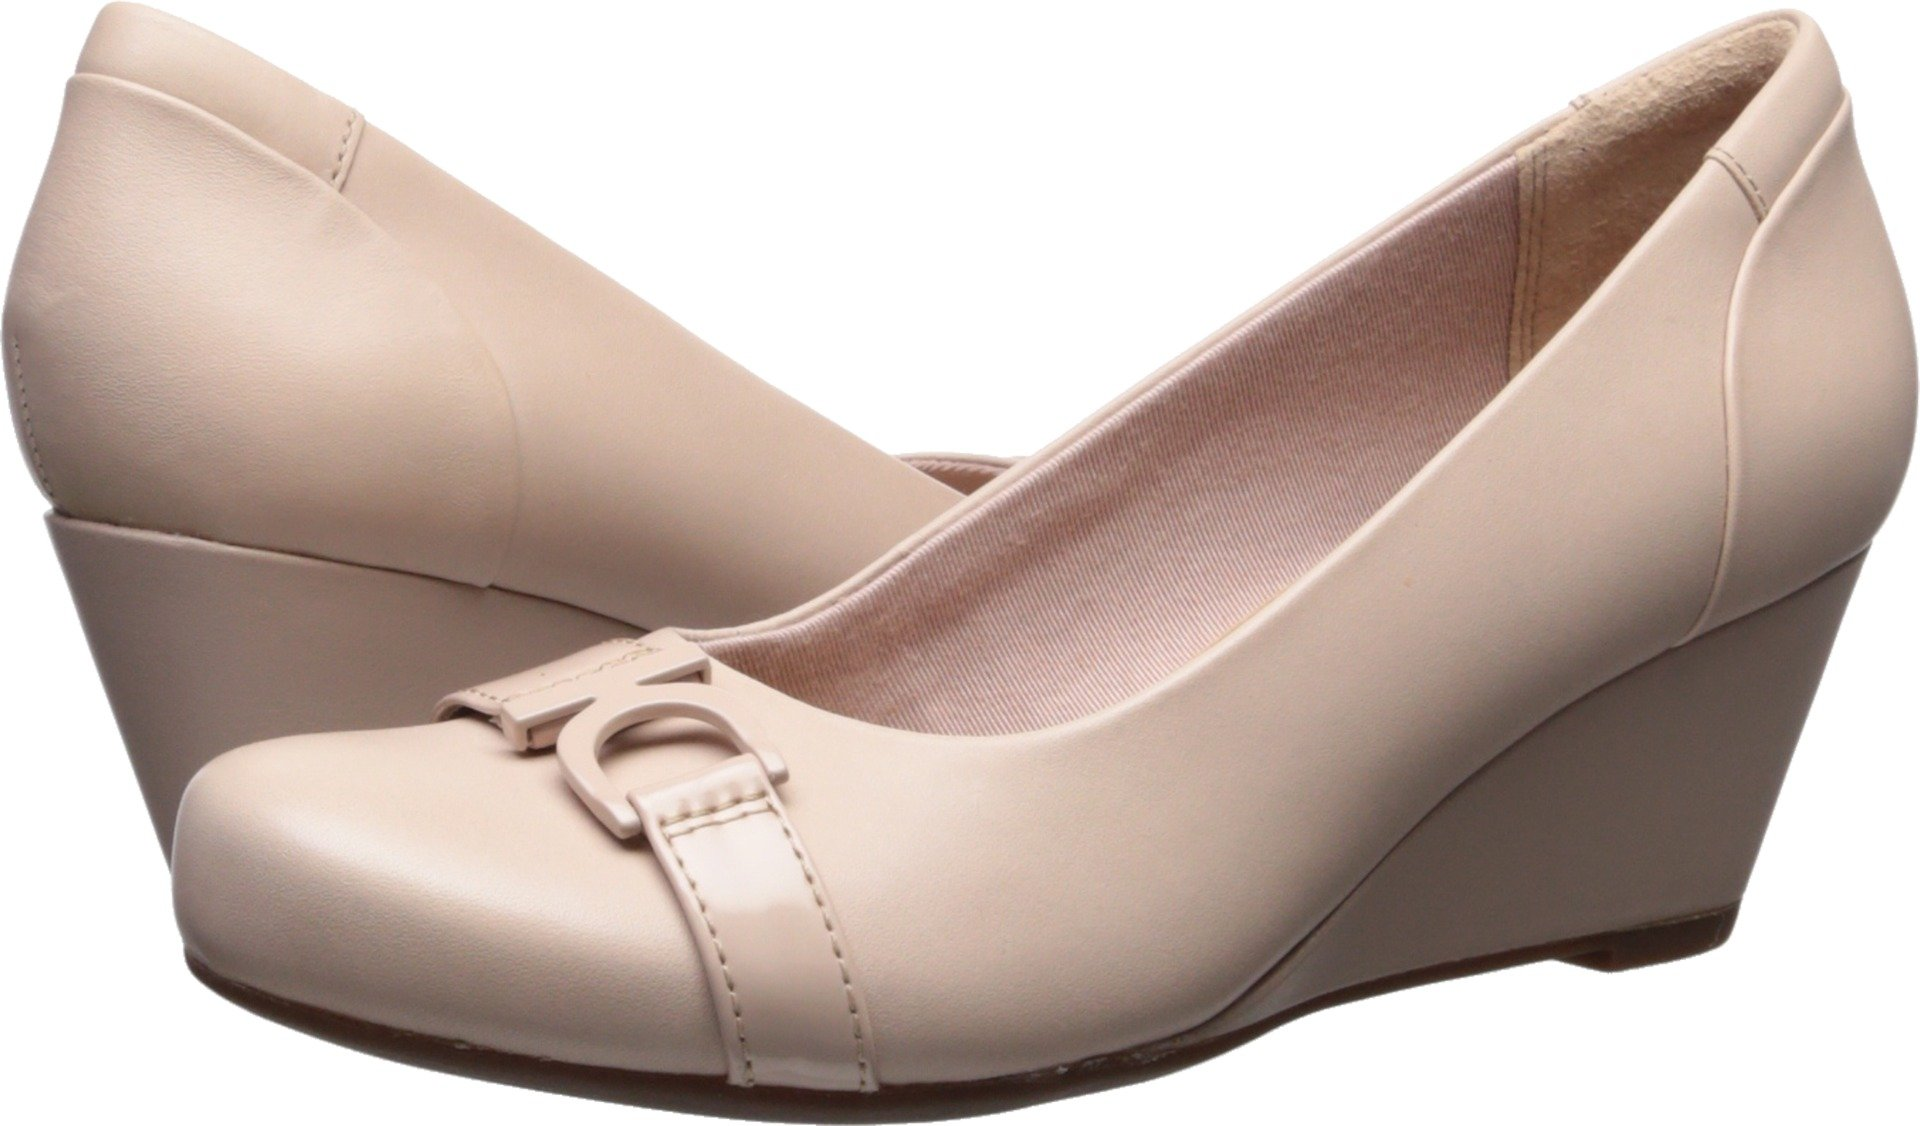 CLARKS Women's Flores Poppy Pump, Cream Leather, 8 B(M) US